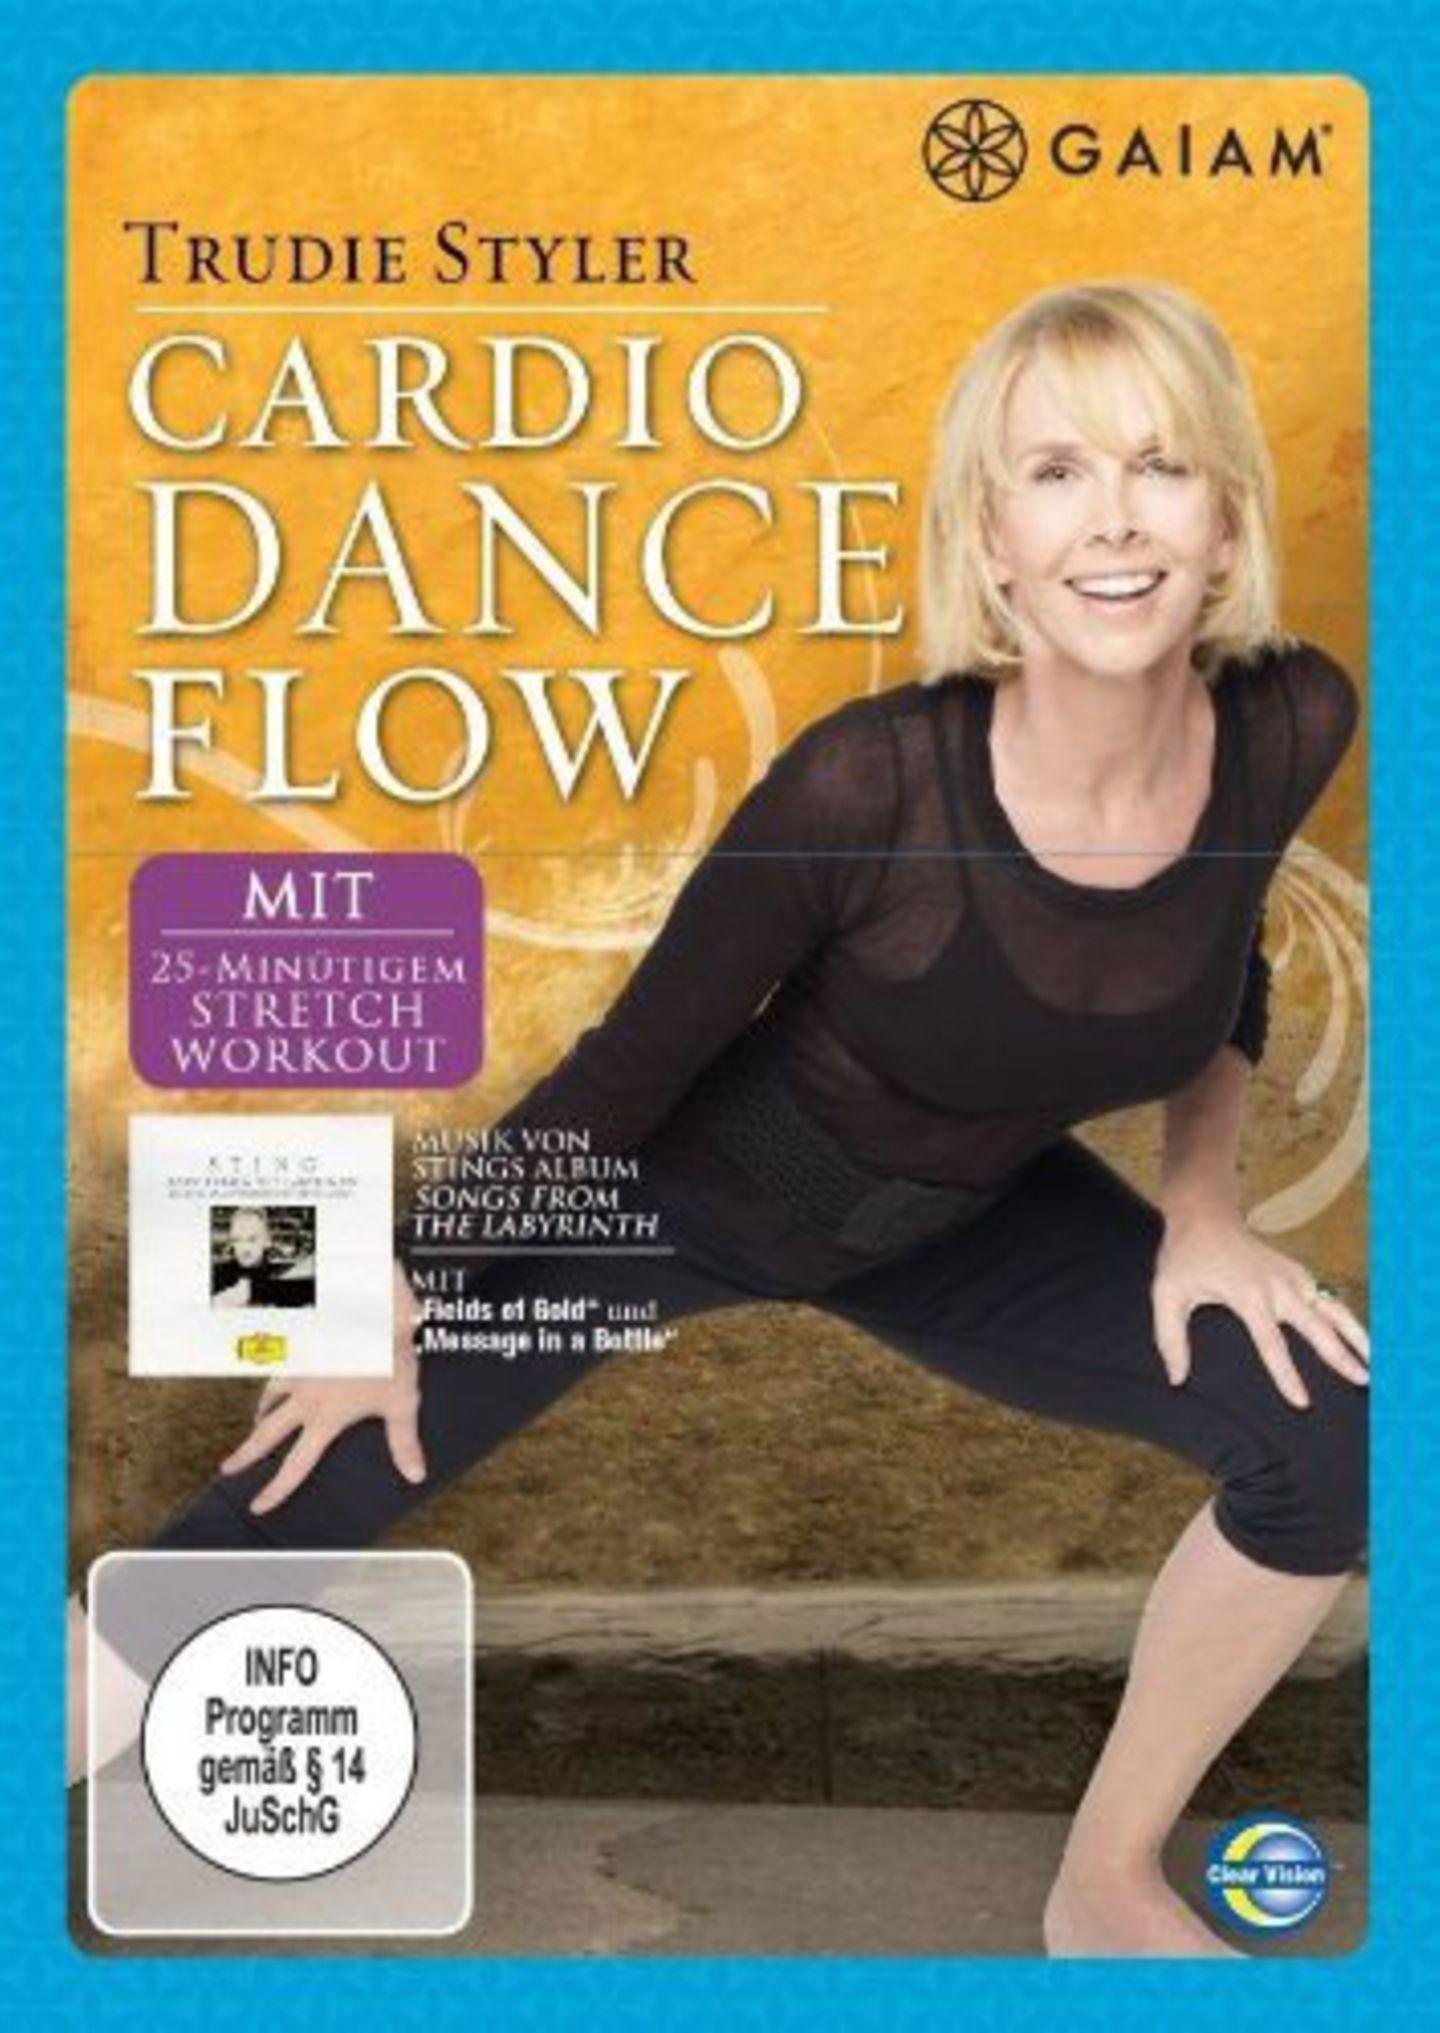 Cardio Dance Flow, Trudie Styler